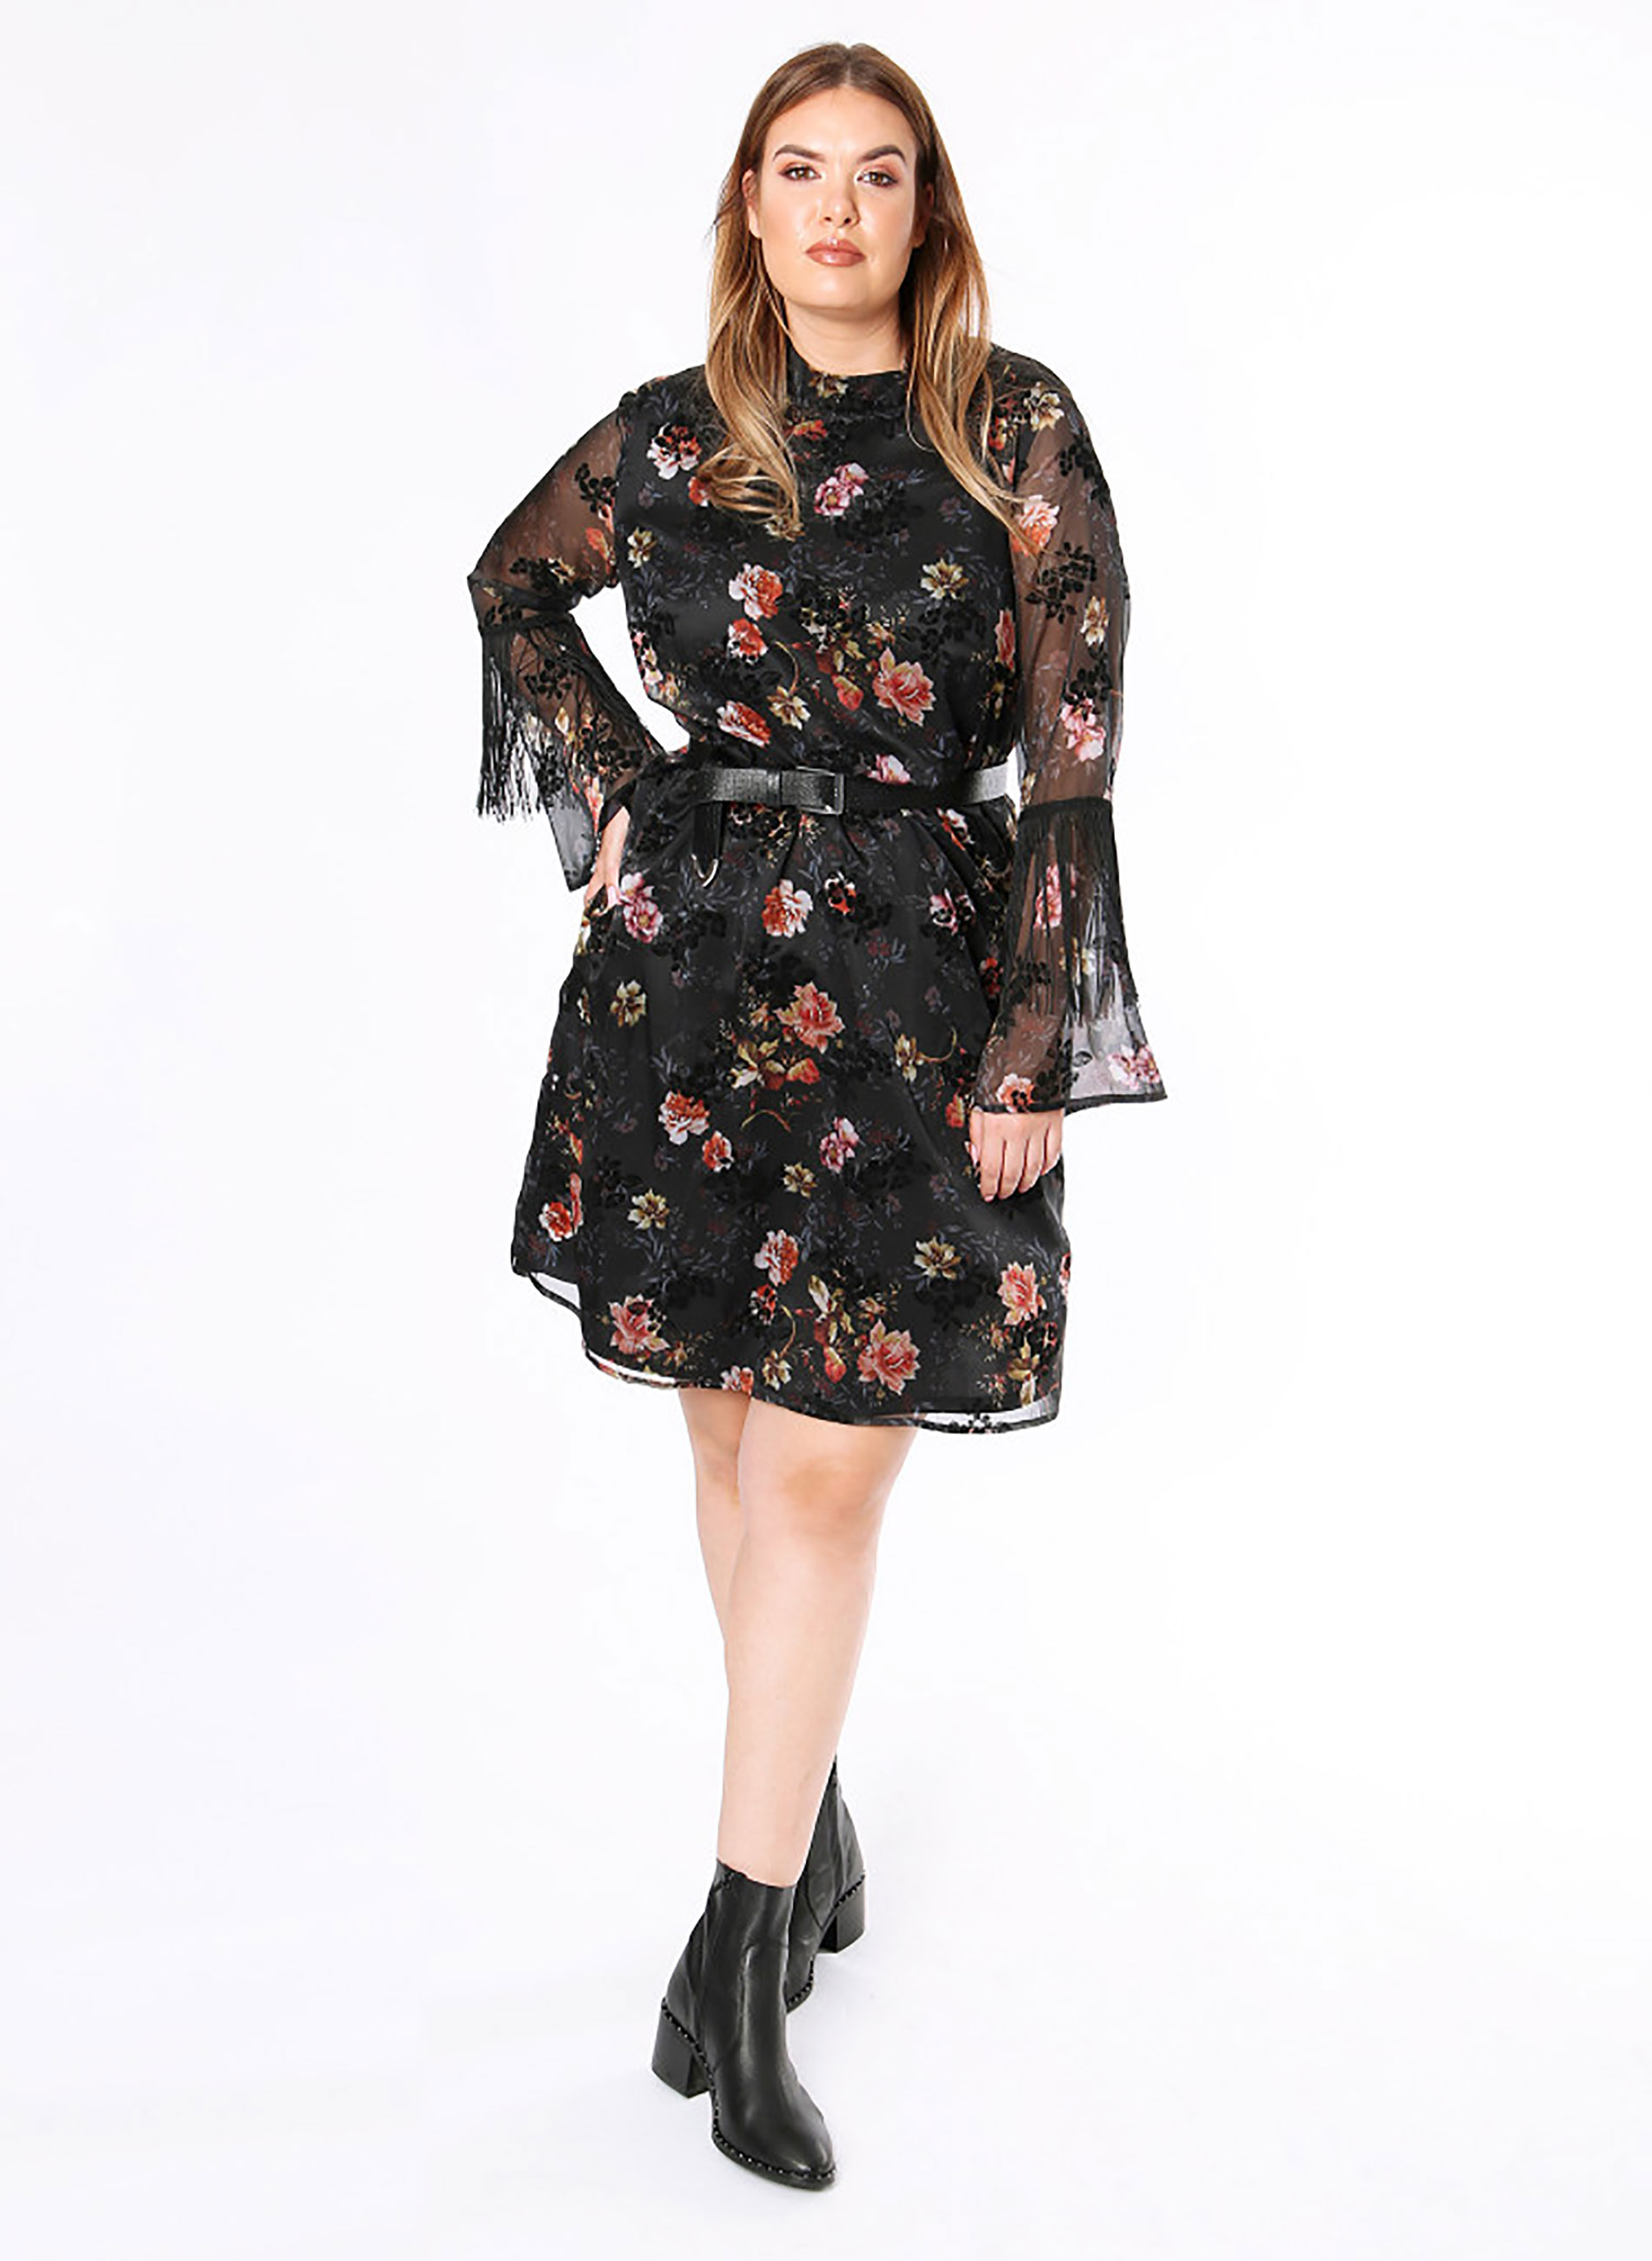 45c7a88a9ef6 ΜΕΓΑΛΑ ΜΕΓΕΘΗ ΦΟΡΕΜΑΤΑ :: Φλοραλ Φόρεμα με Κρόσσια στο Μανίκι - Μόδα ...